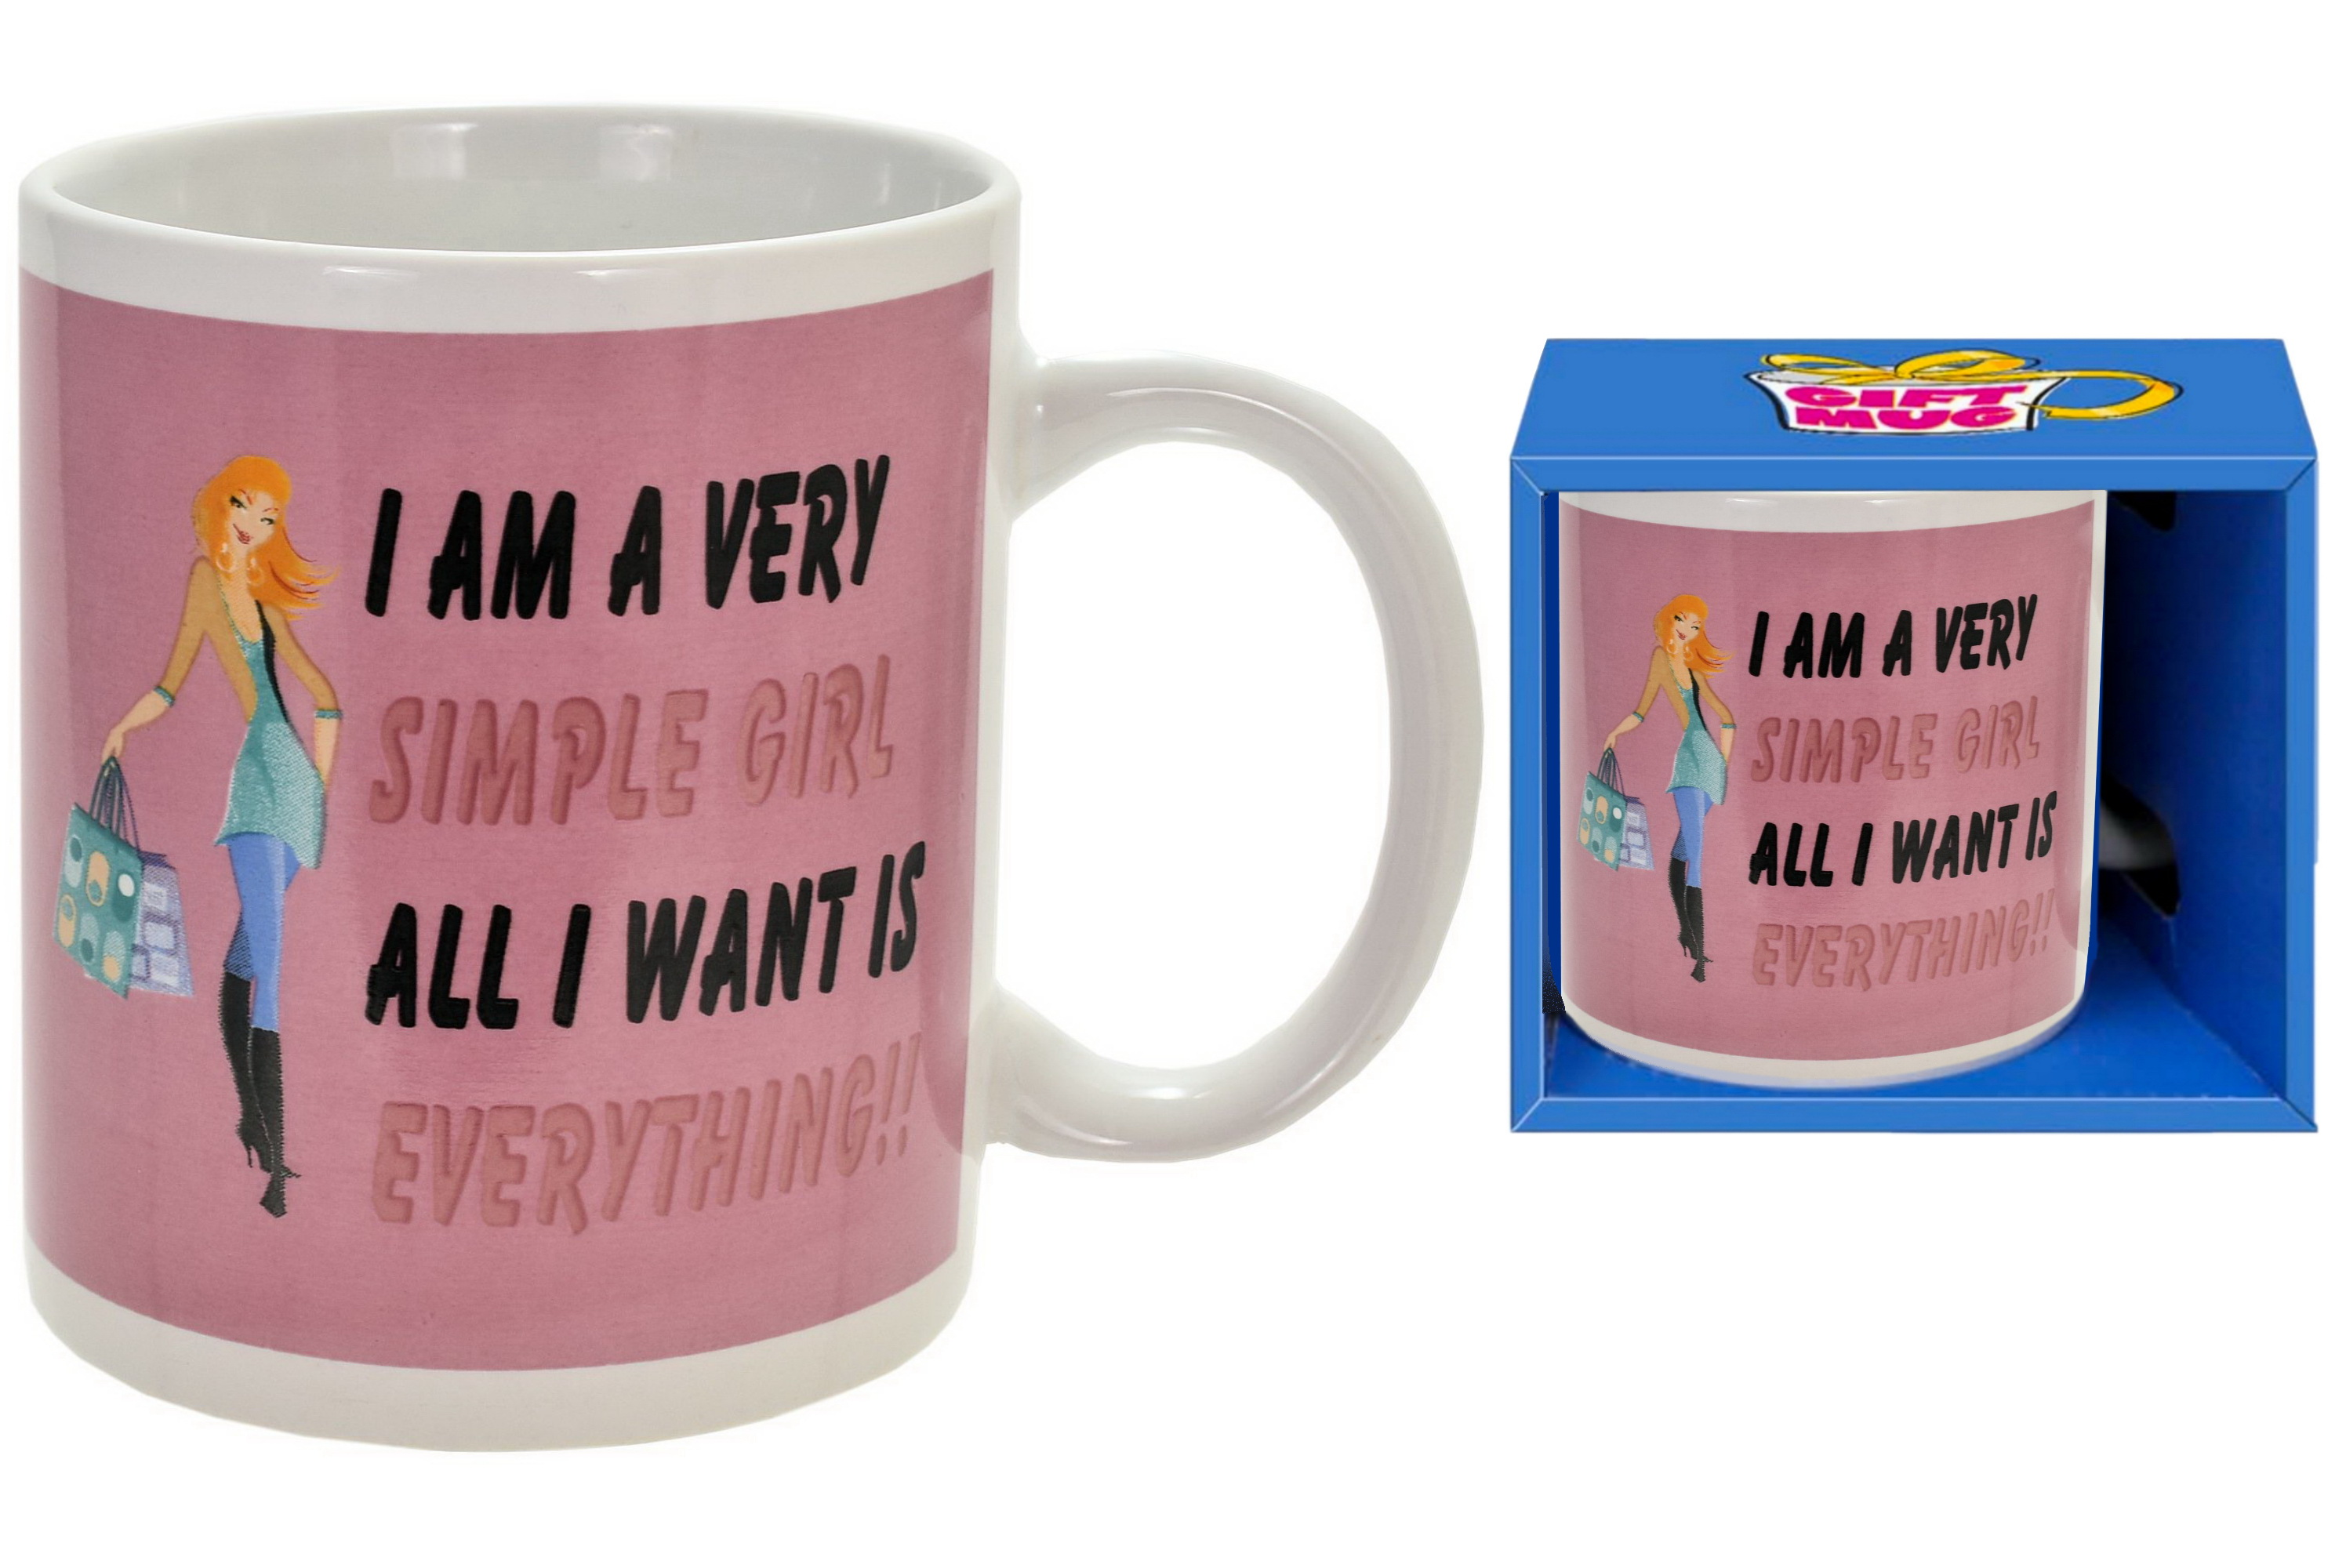 Simple Girl Mug In Gift Box